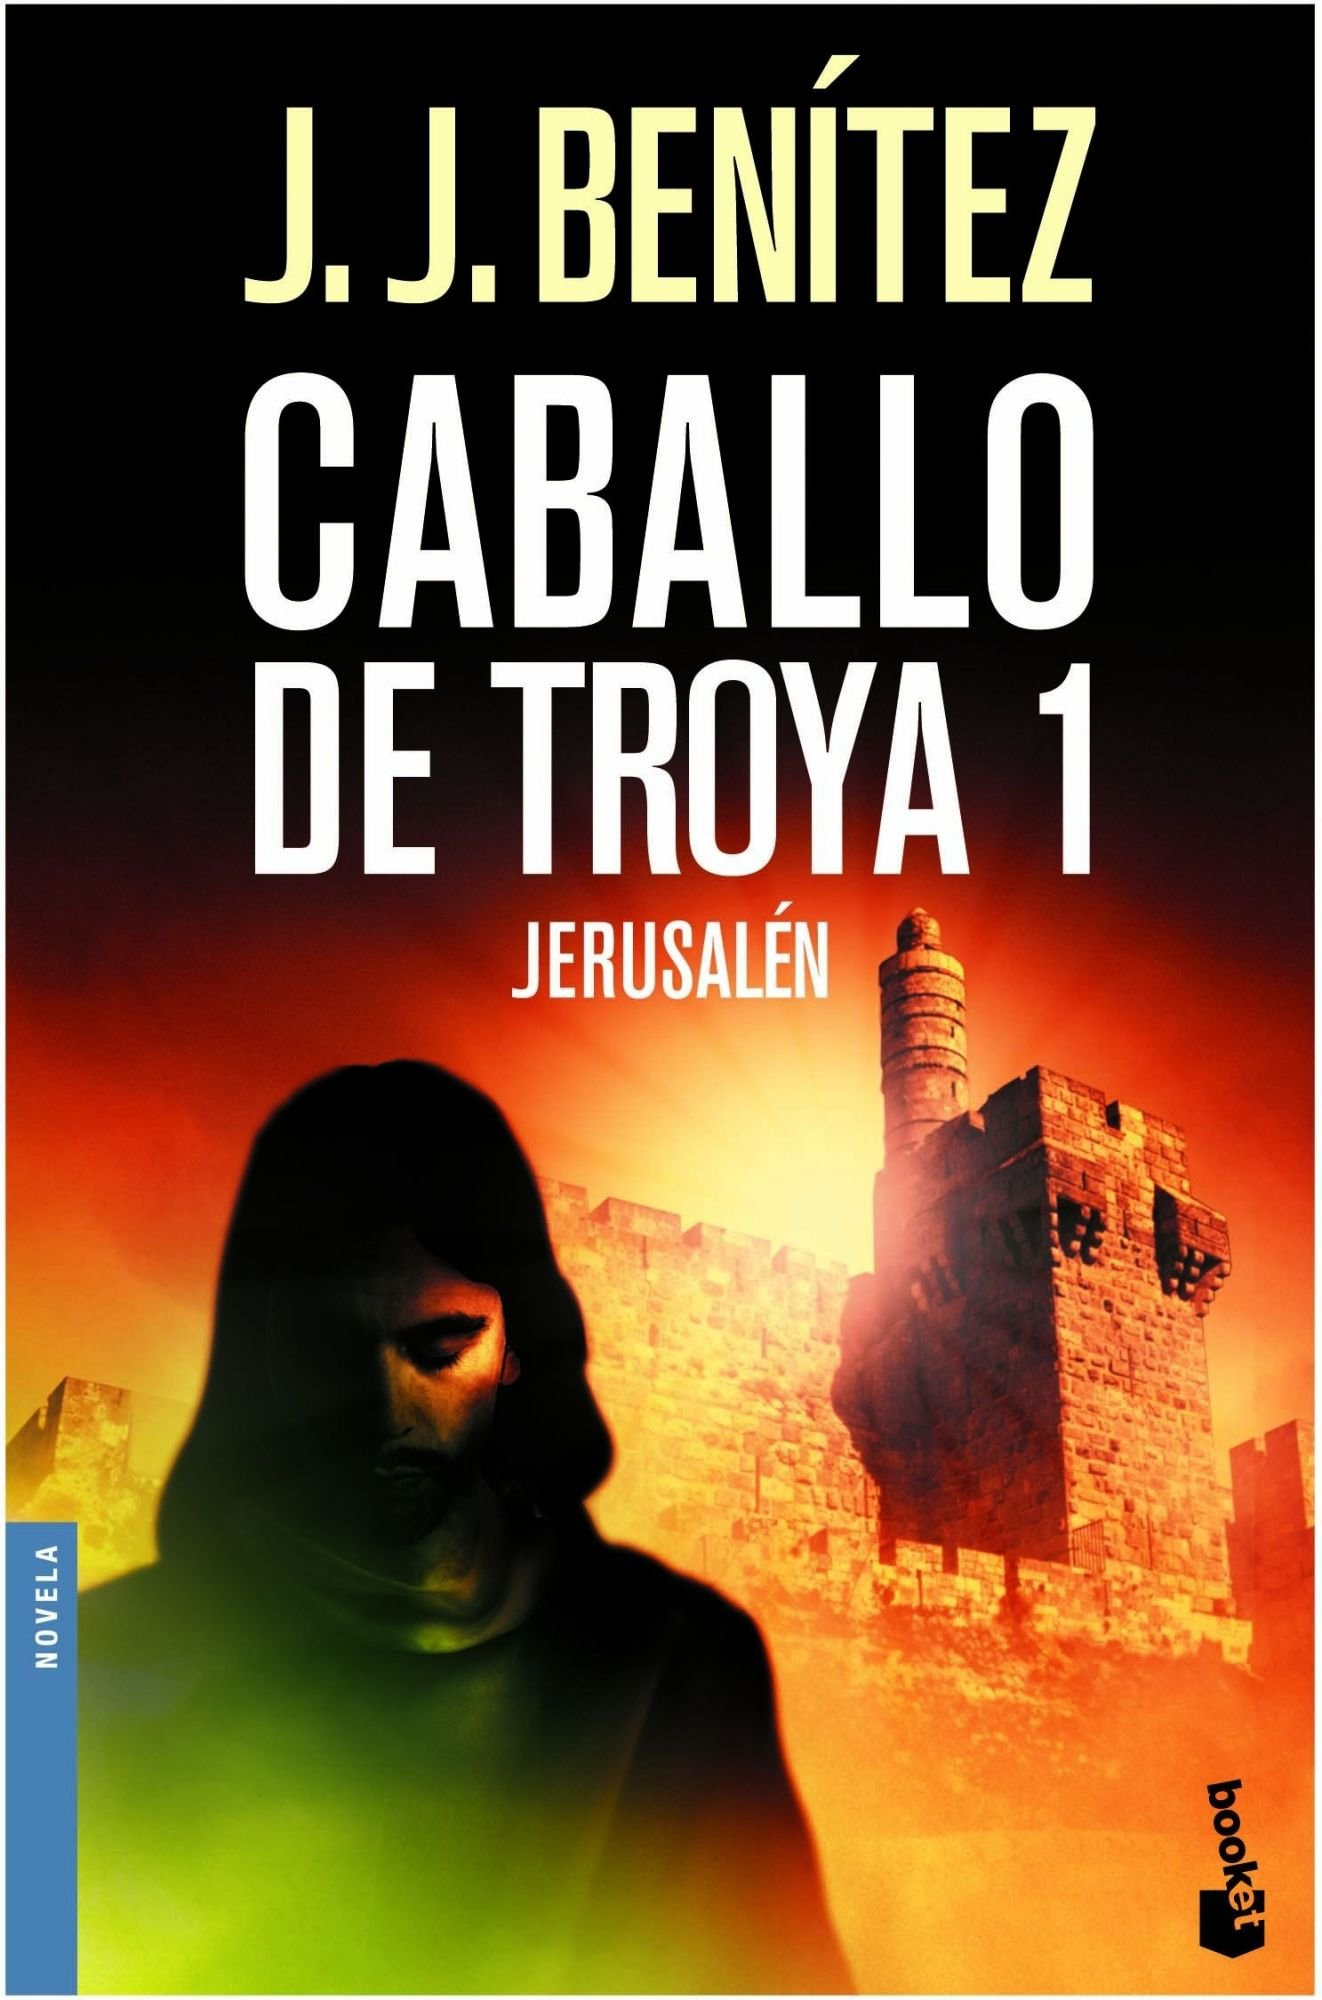 Jerusalén. Caballo de Troya 1 Biblioteca J. J. Benítez: Amazon.es ...